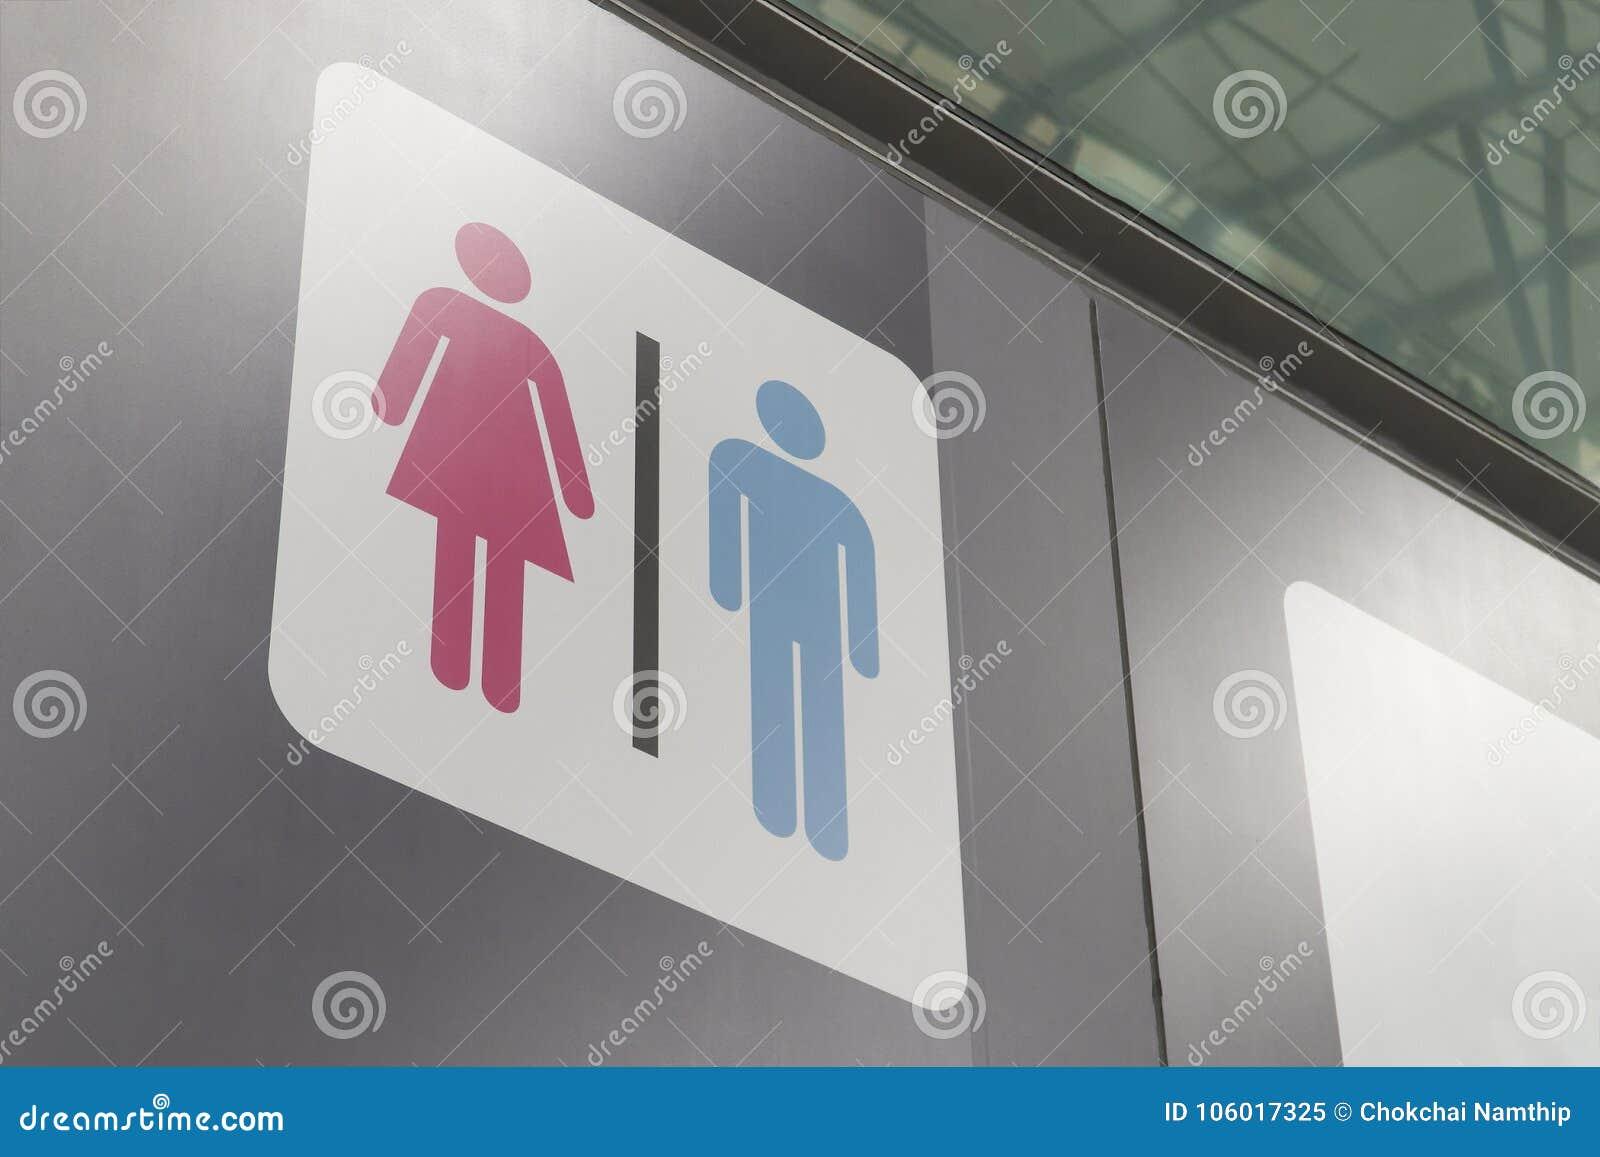 Symbole De Salle De Bains Hommes-femmes, Bleu Masculin Rose Femelle ...